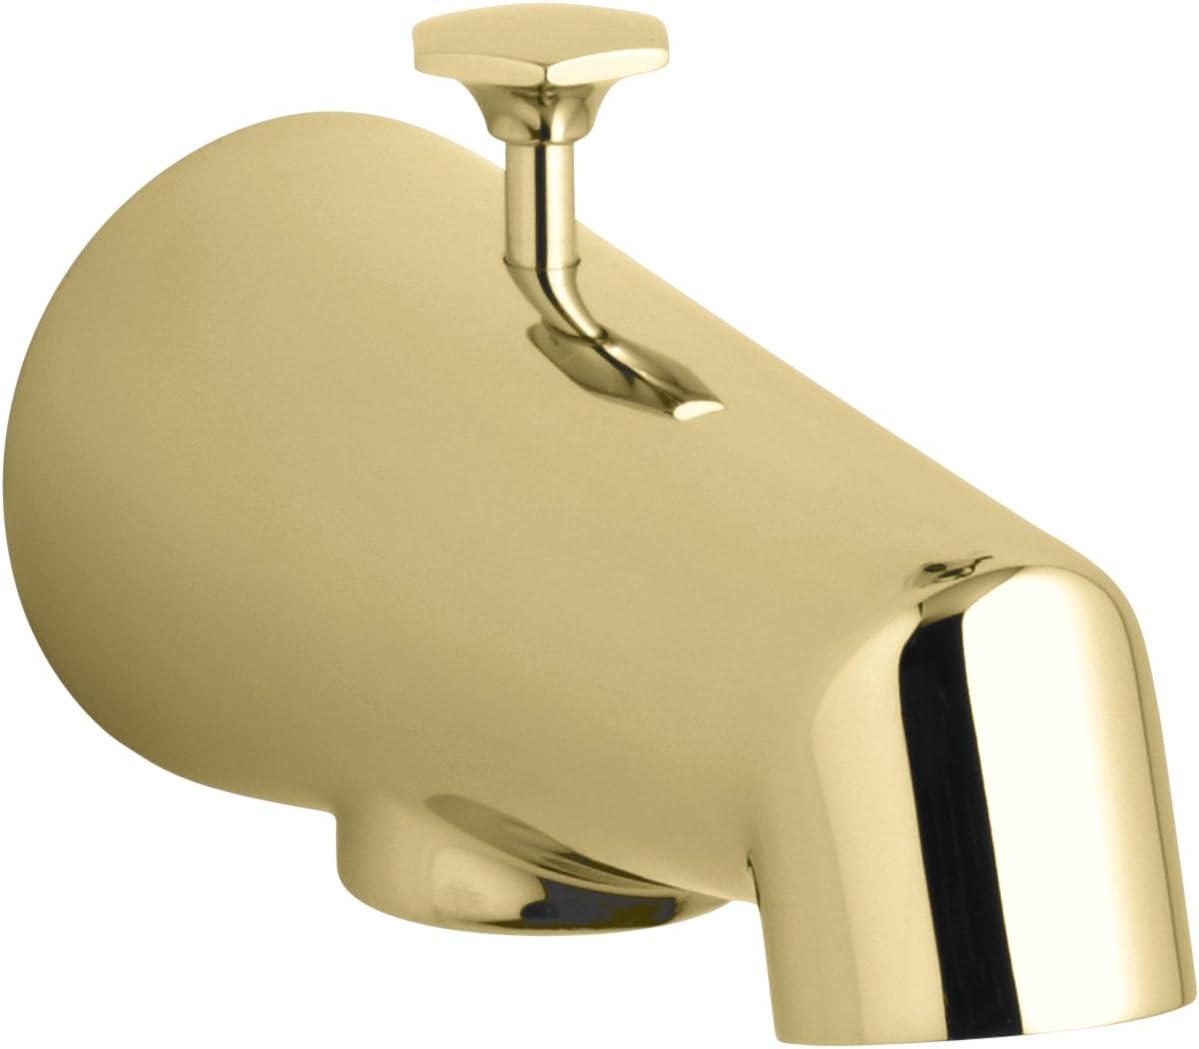 KOHLER K-6855-PB Standard Diverter Bath Spout, Vibrant Polished Brass